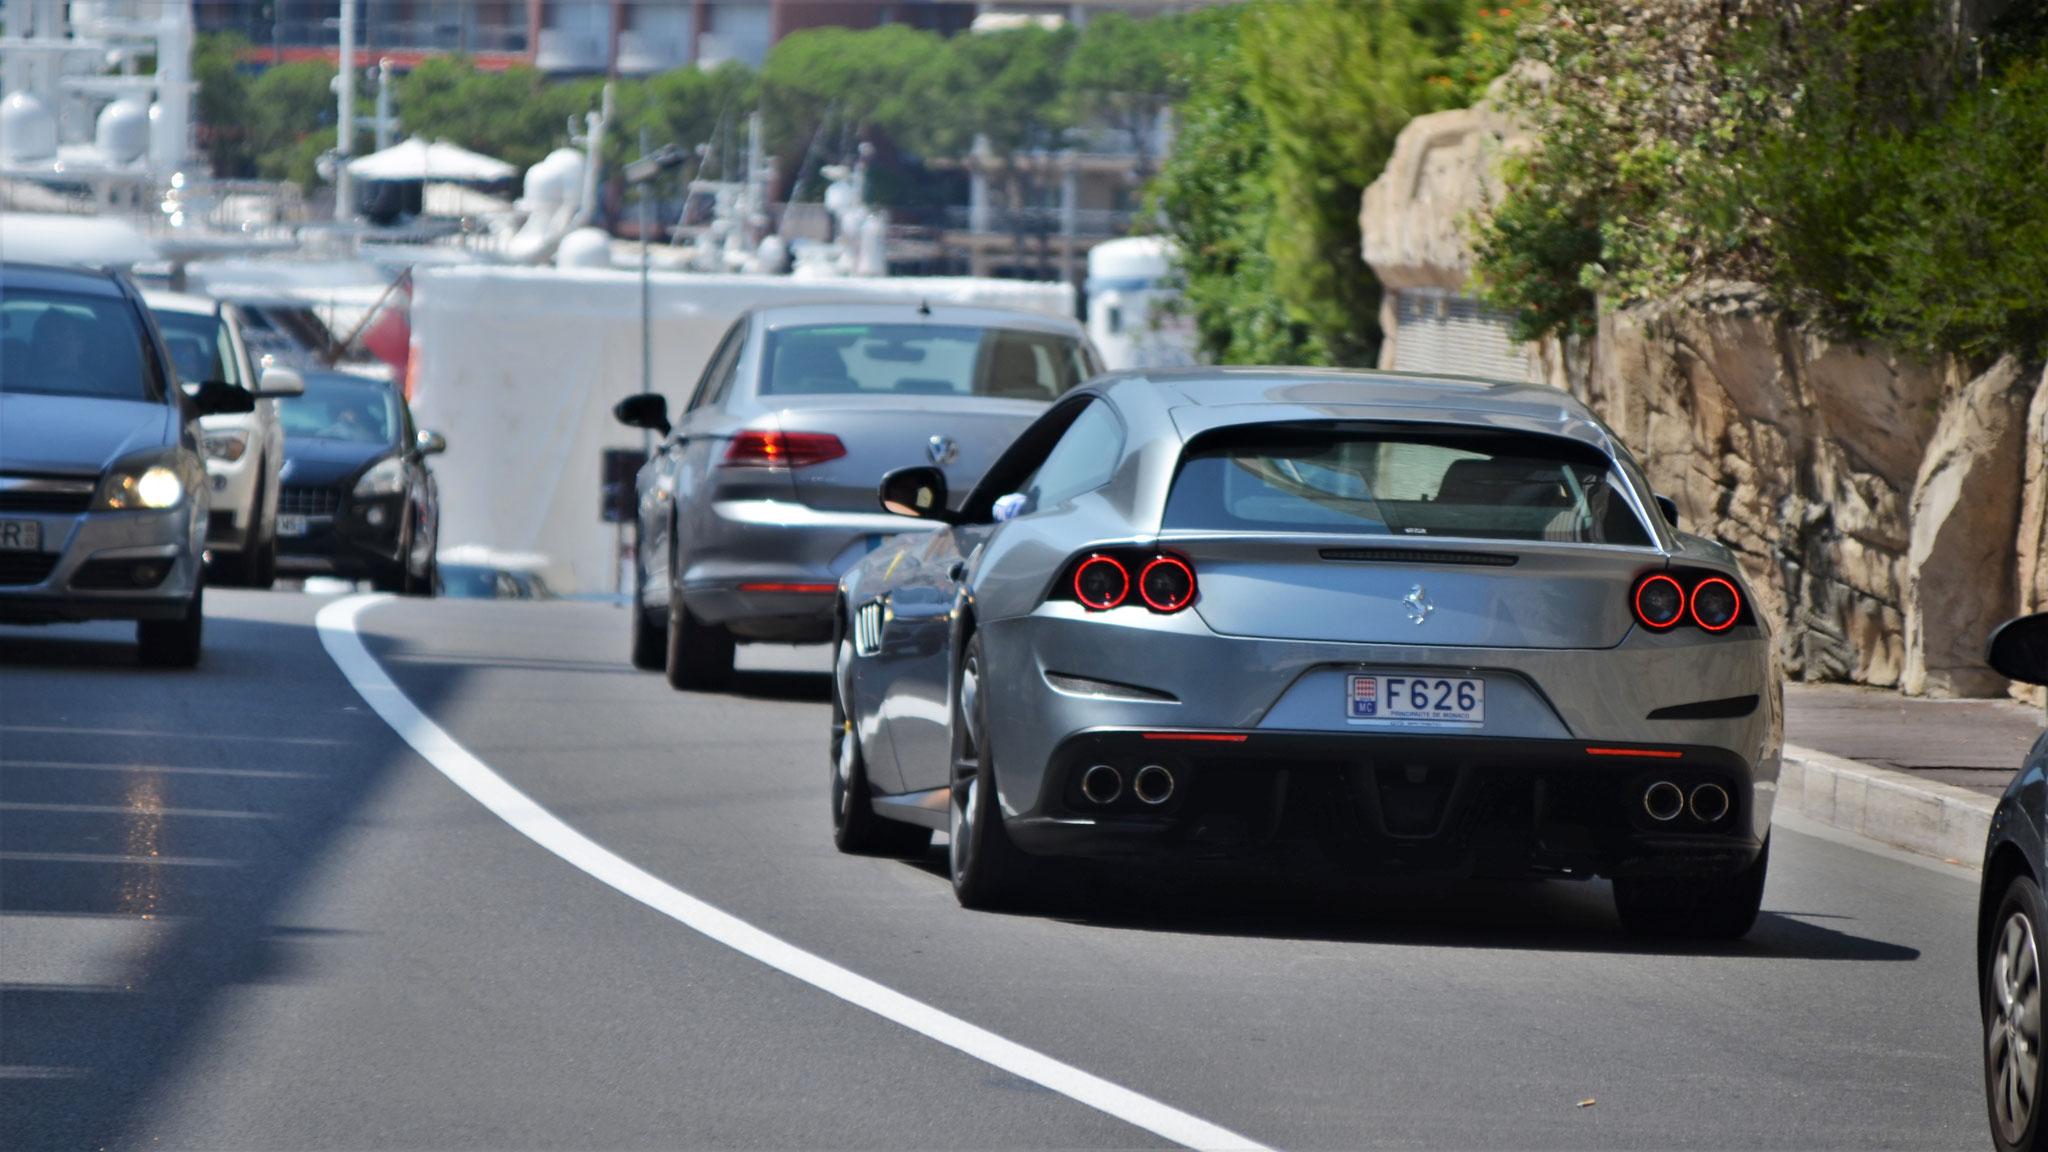 Ferrari GTC4 Lusso - F626 (MC)